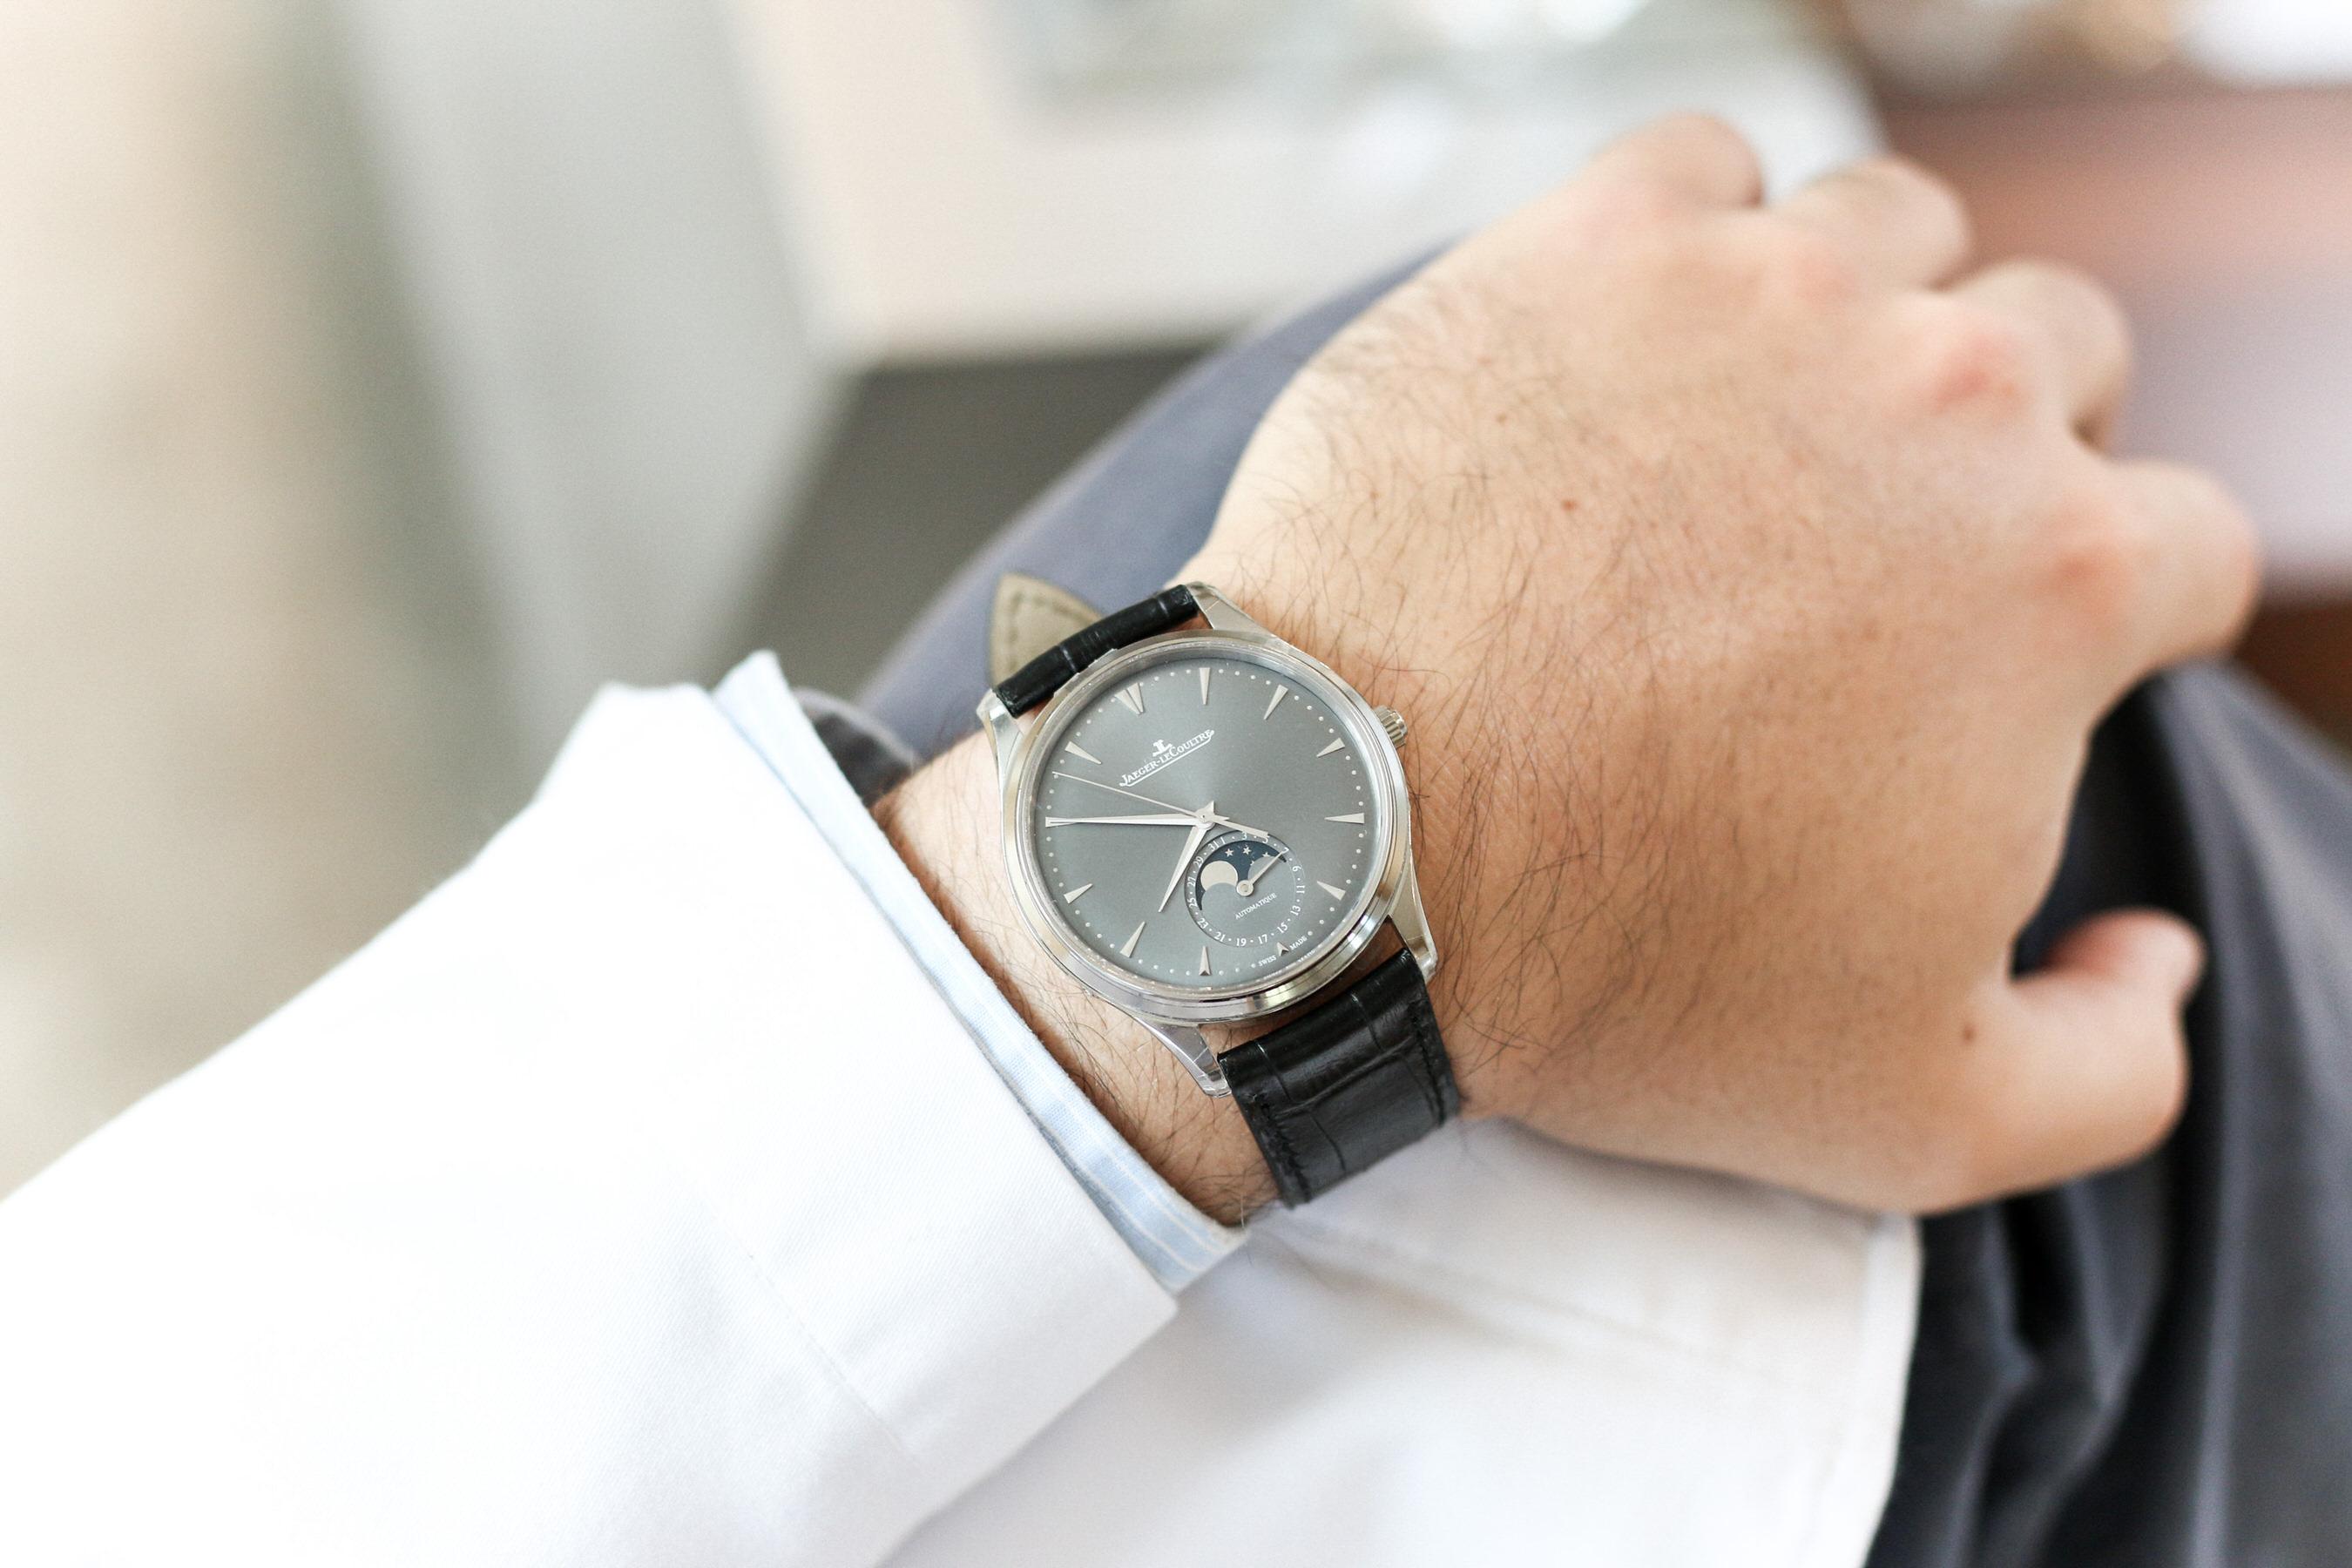 Master Ultra thin en or gris cadran gros portee wristshot